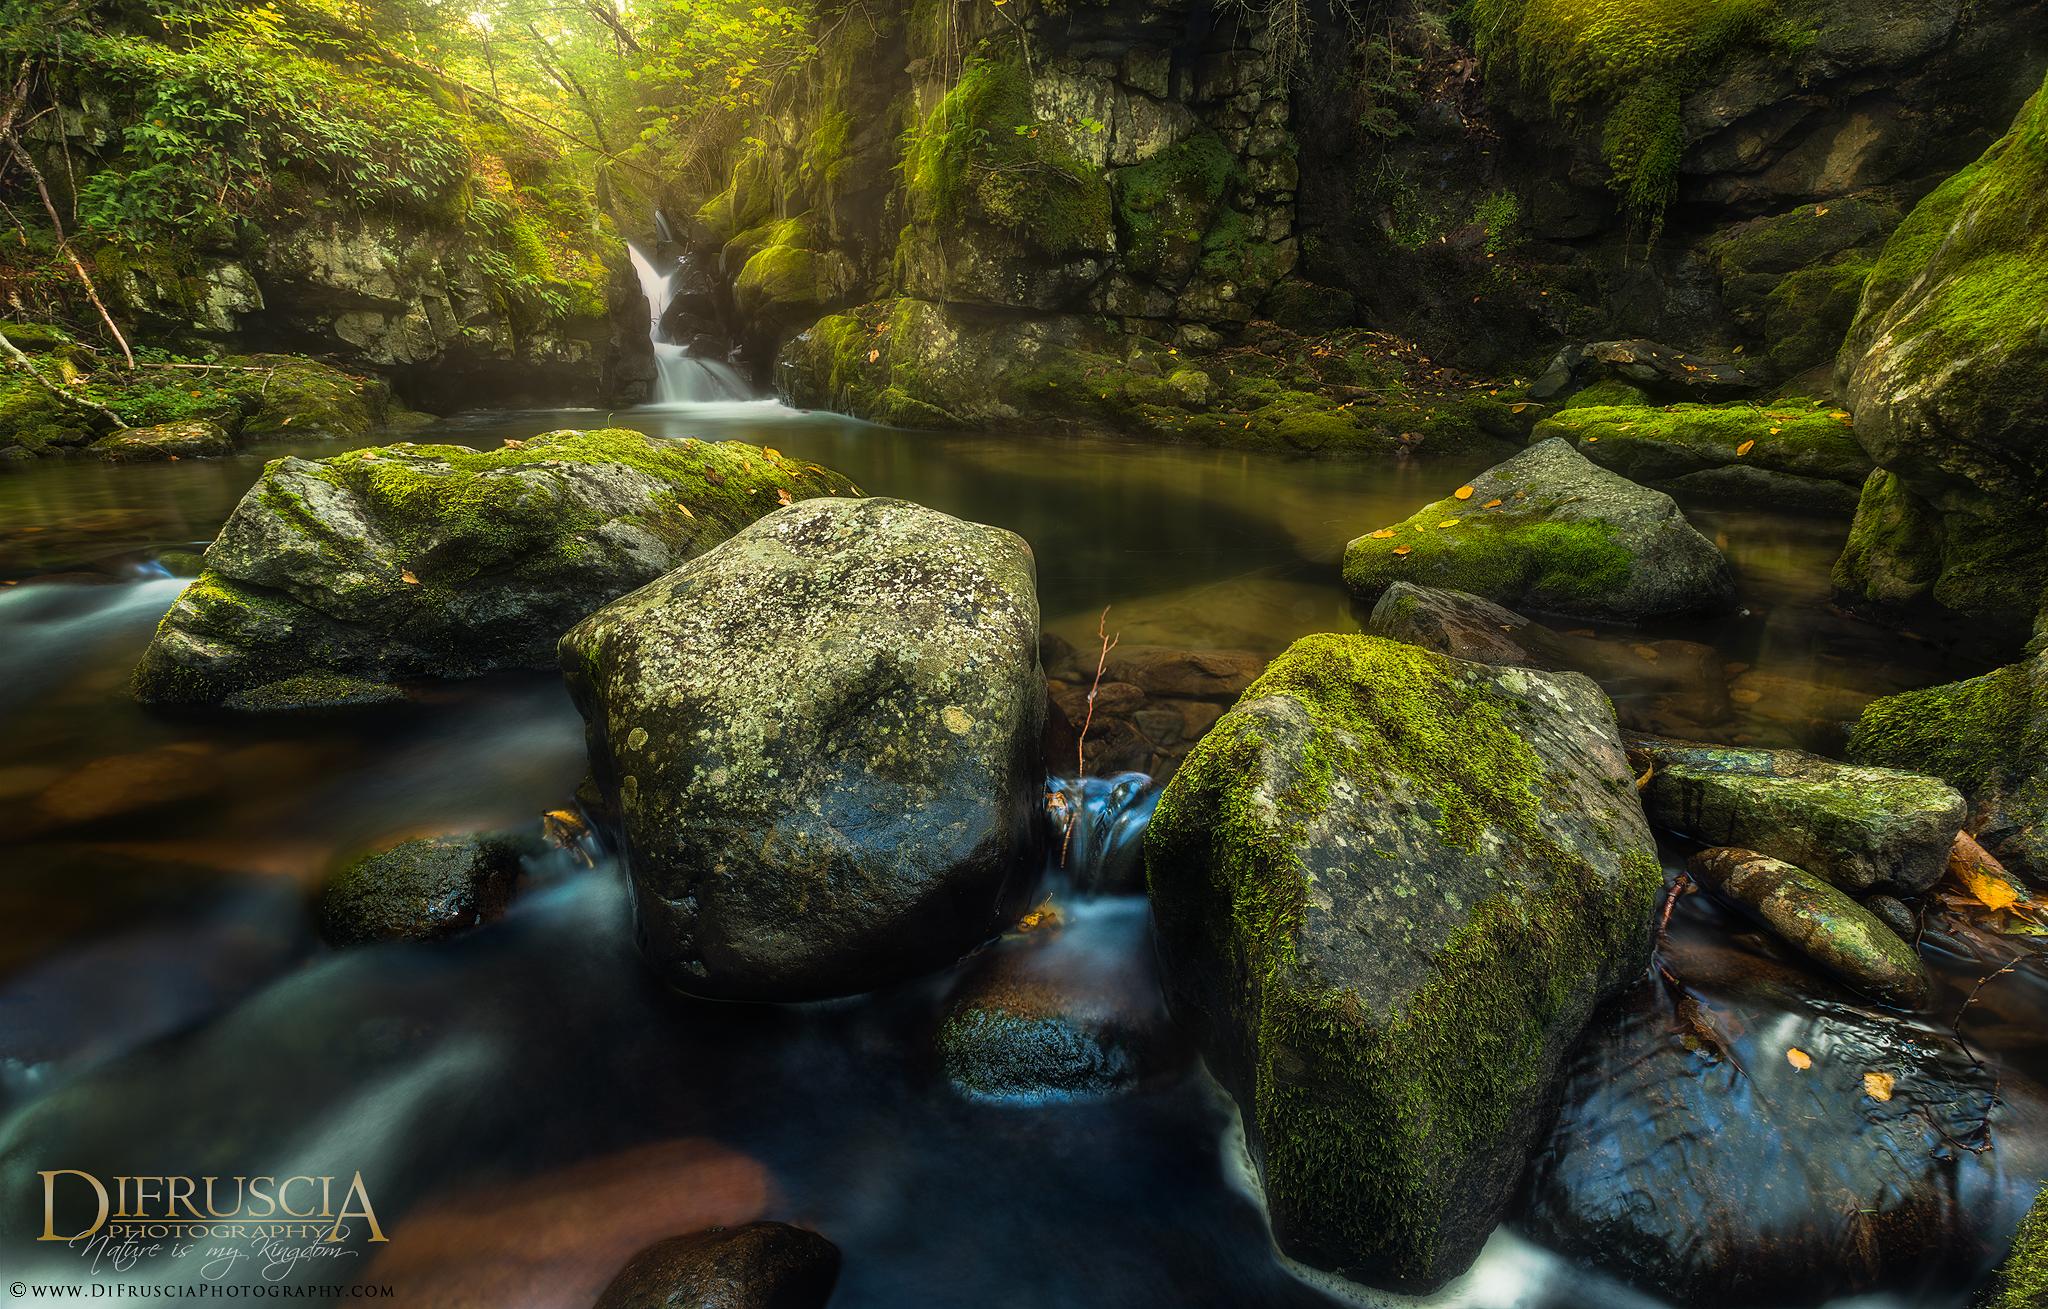 Mt-Megantic, Quebec, National Park, Fall, Waterfall, Fine Art Photography, SEPAQ, Nature, Moss, FIne Art print, Limited edition prints, Green, Landscape Photographer, Photography tours